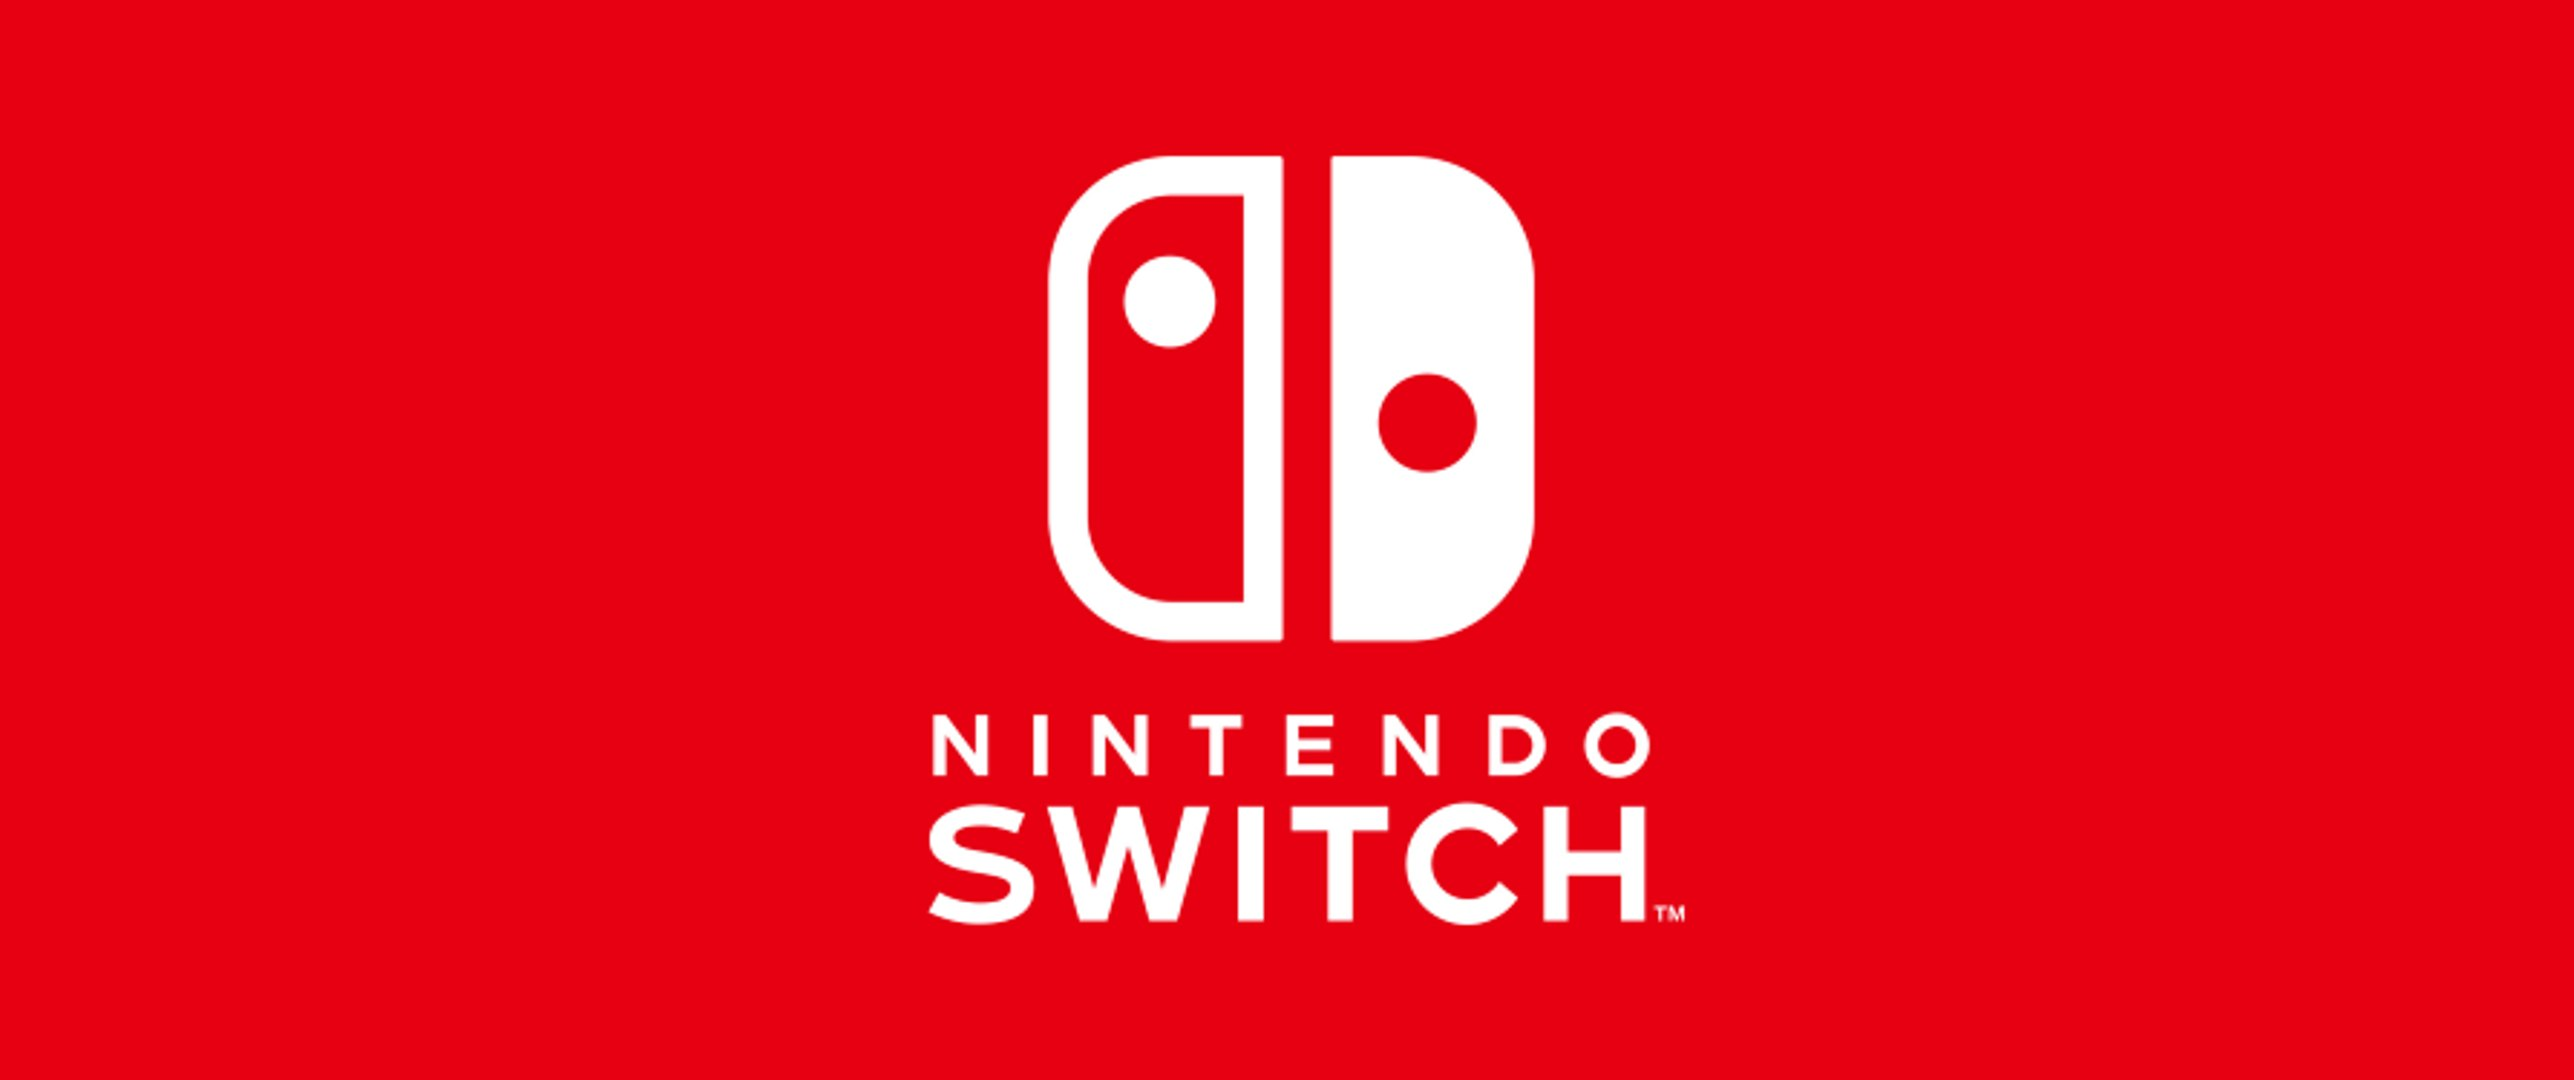 Nintendo Switch: Teaser